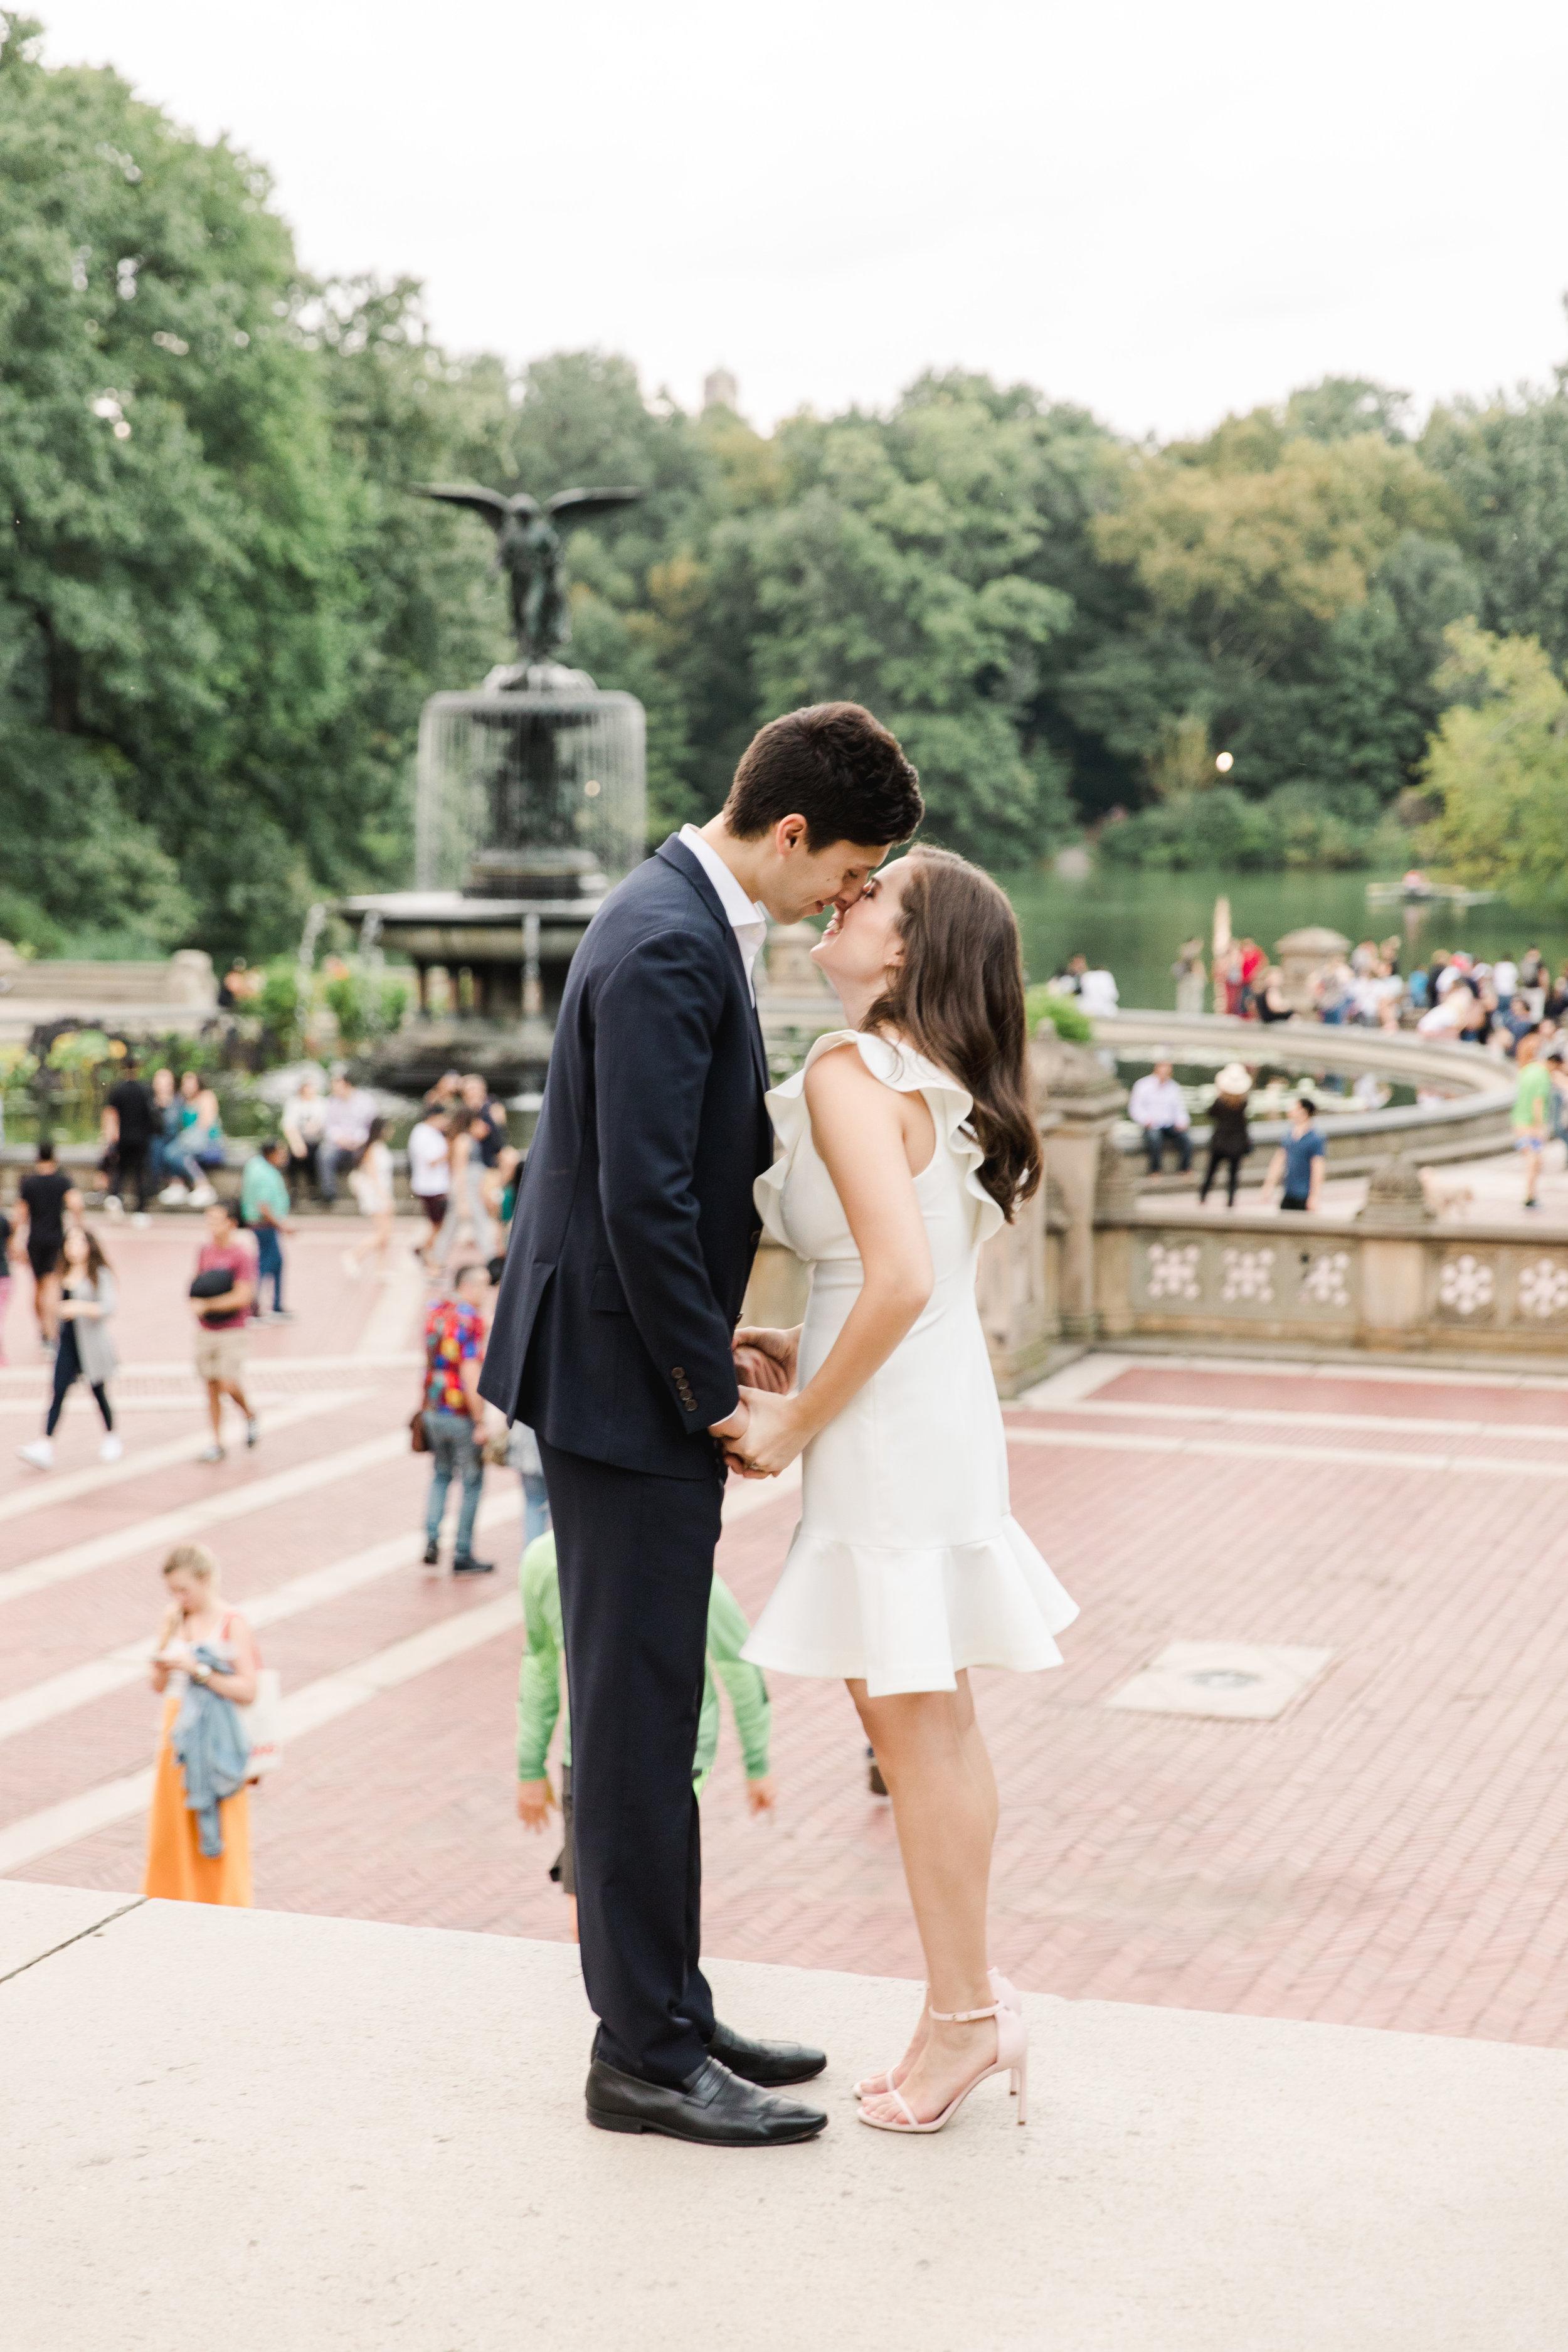 Hudson-Nichols-Central-Park-New-York-City-Fine-Art-Film-Engagement-Photography-24.jpg